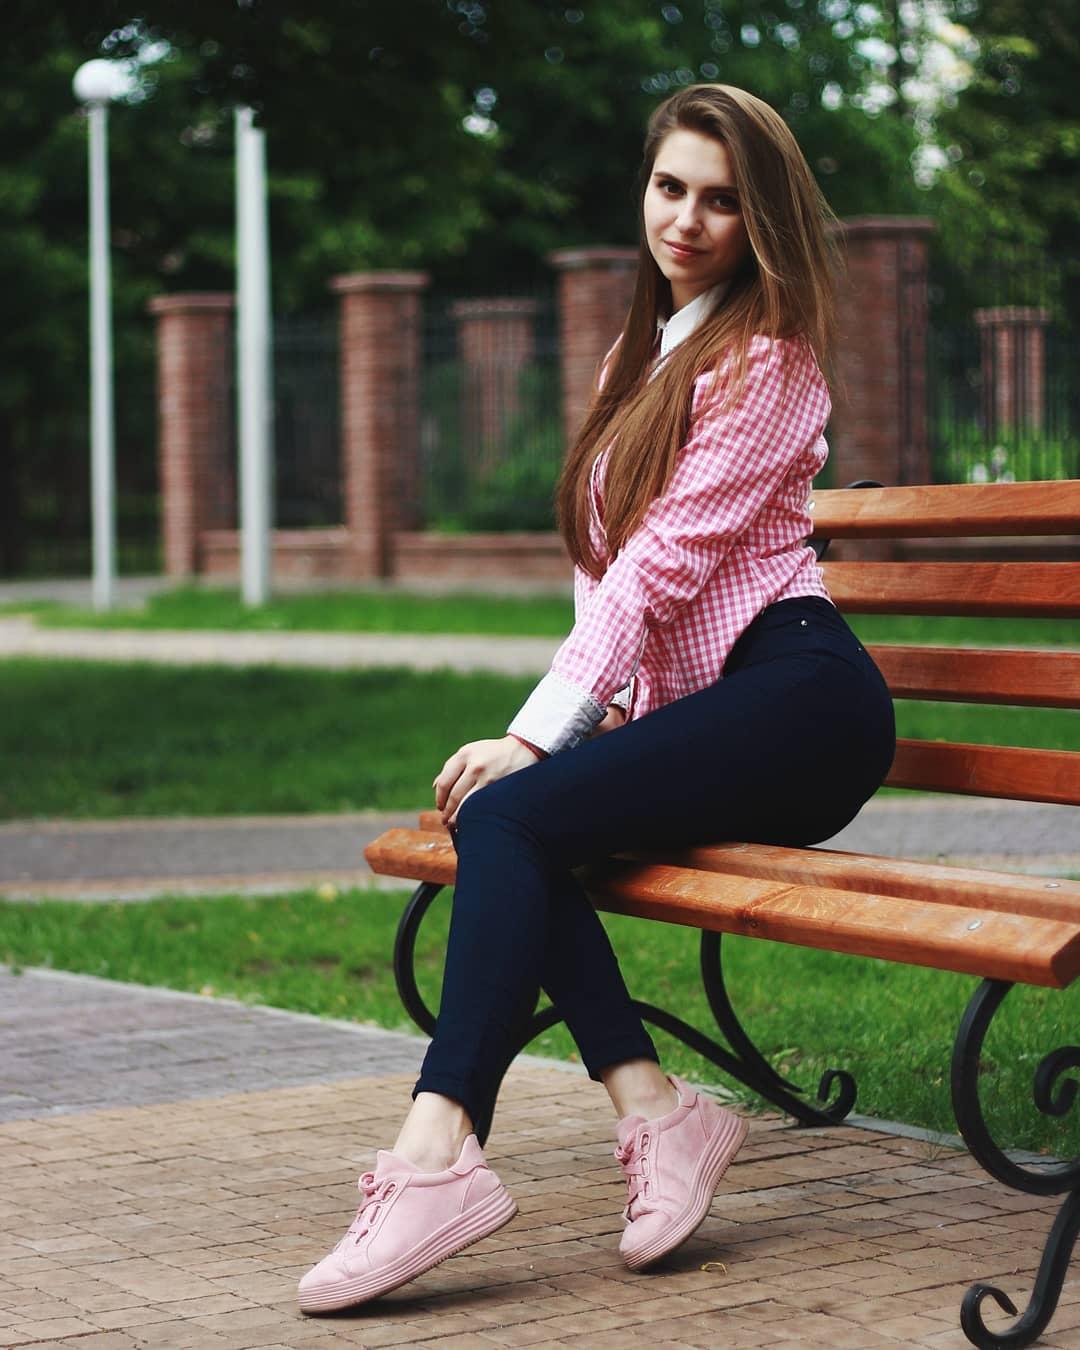 Katya-Melnyk-Wallpapers-Insta-Biography-2